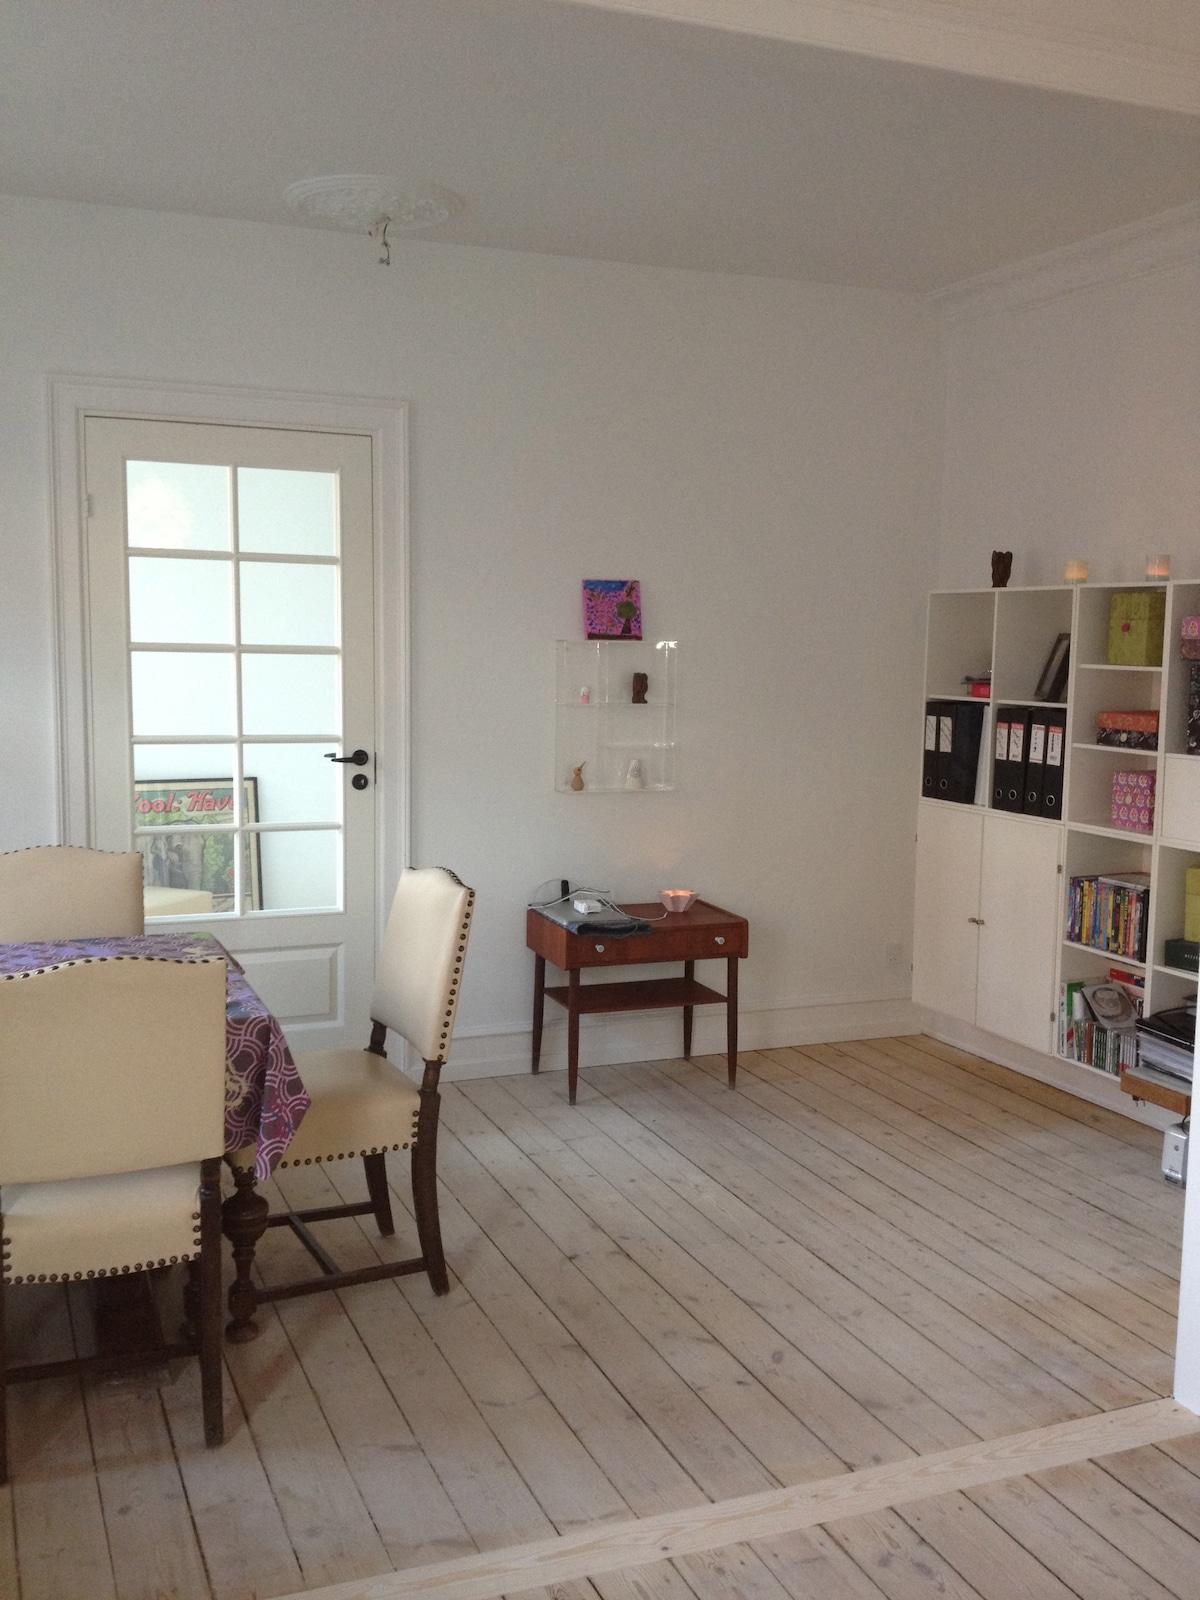 LovelyLocal apartment,Frederiksberg